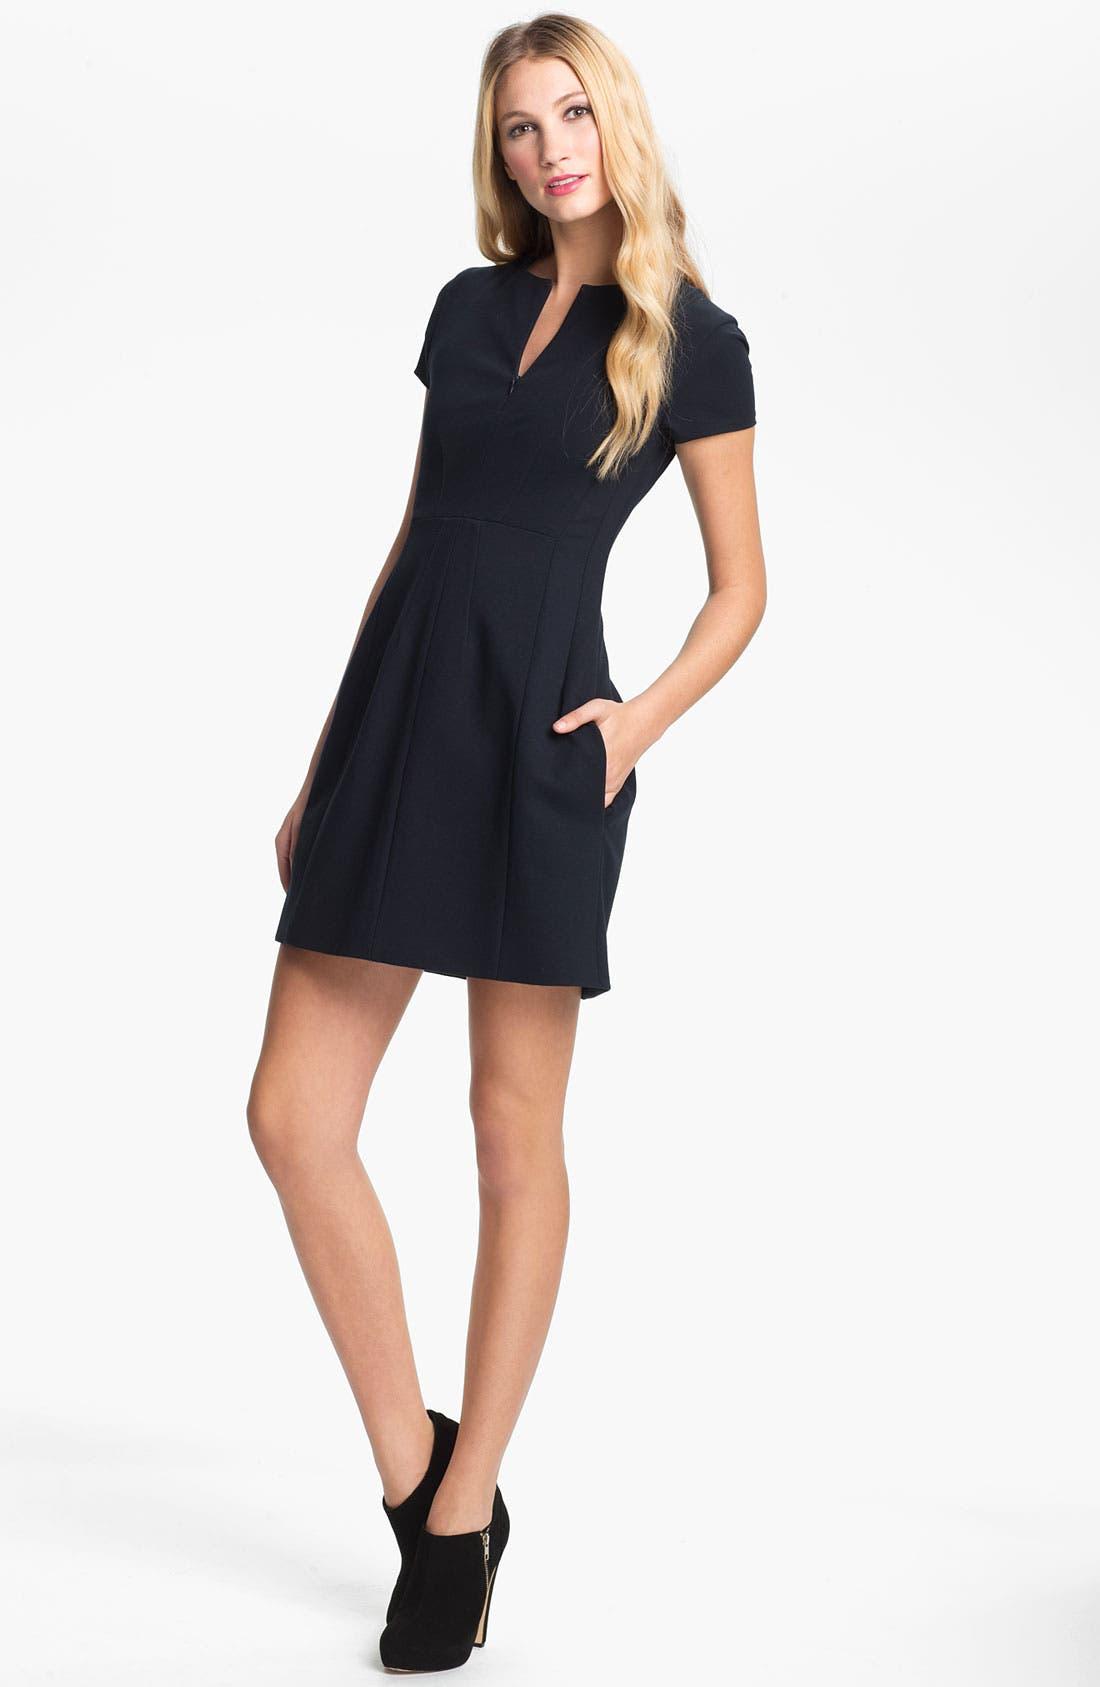 Main Image - Diane von Furstenberg 'Agatha' Knit Sheath Dress